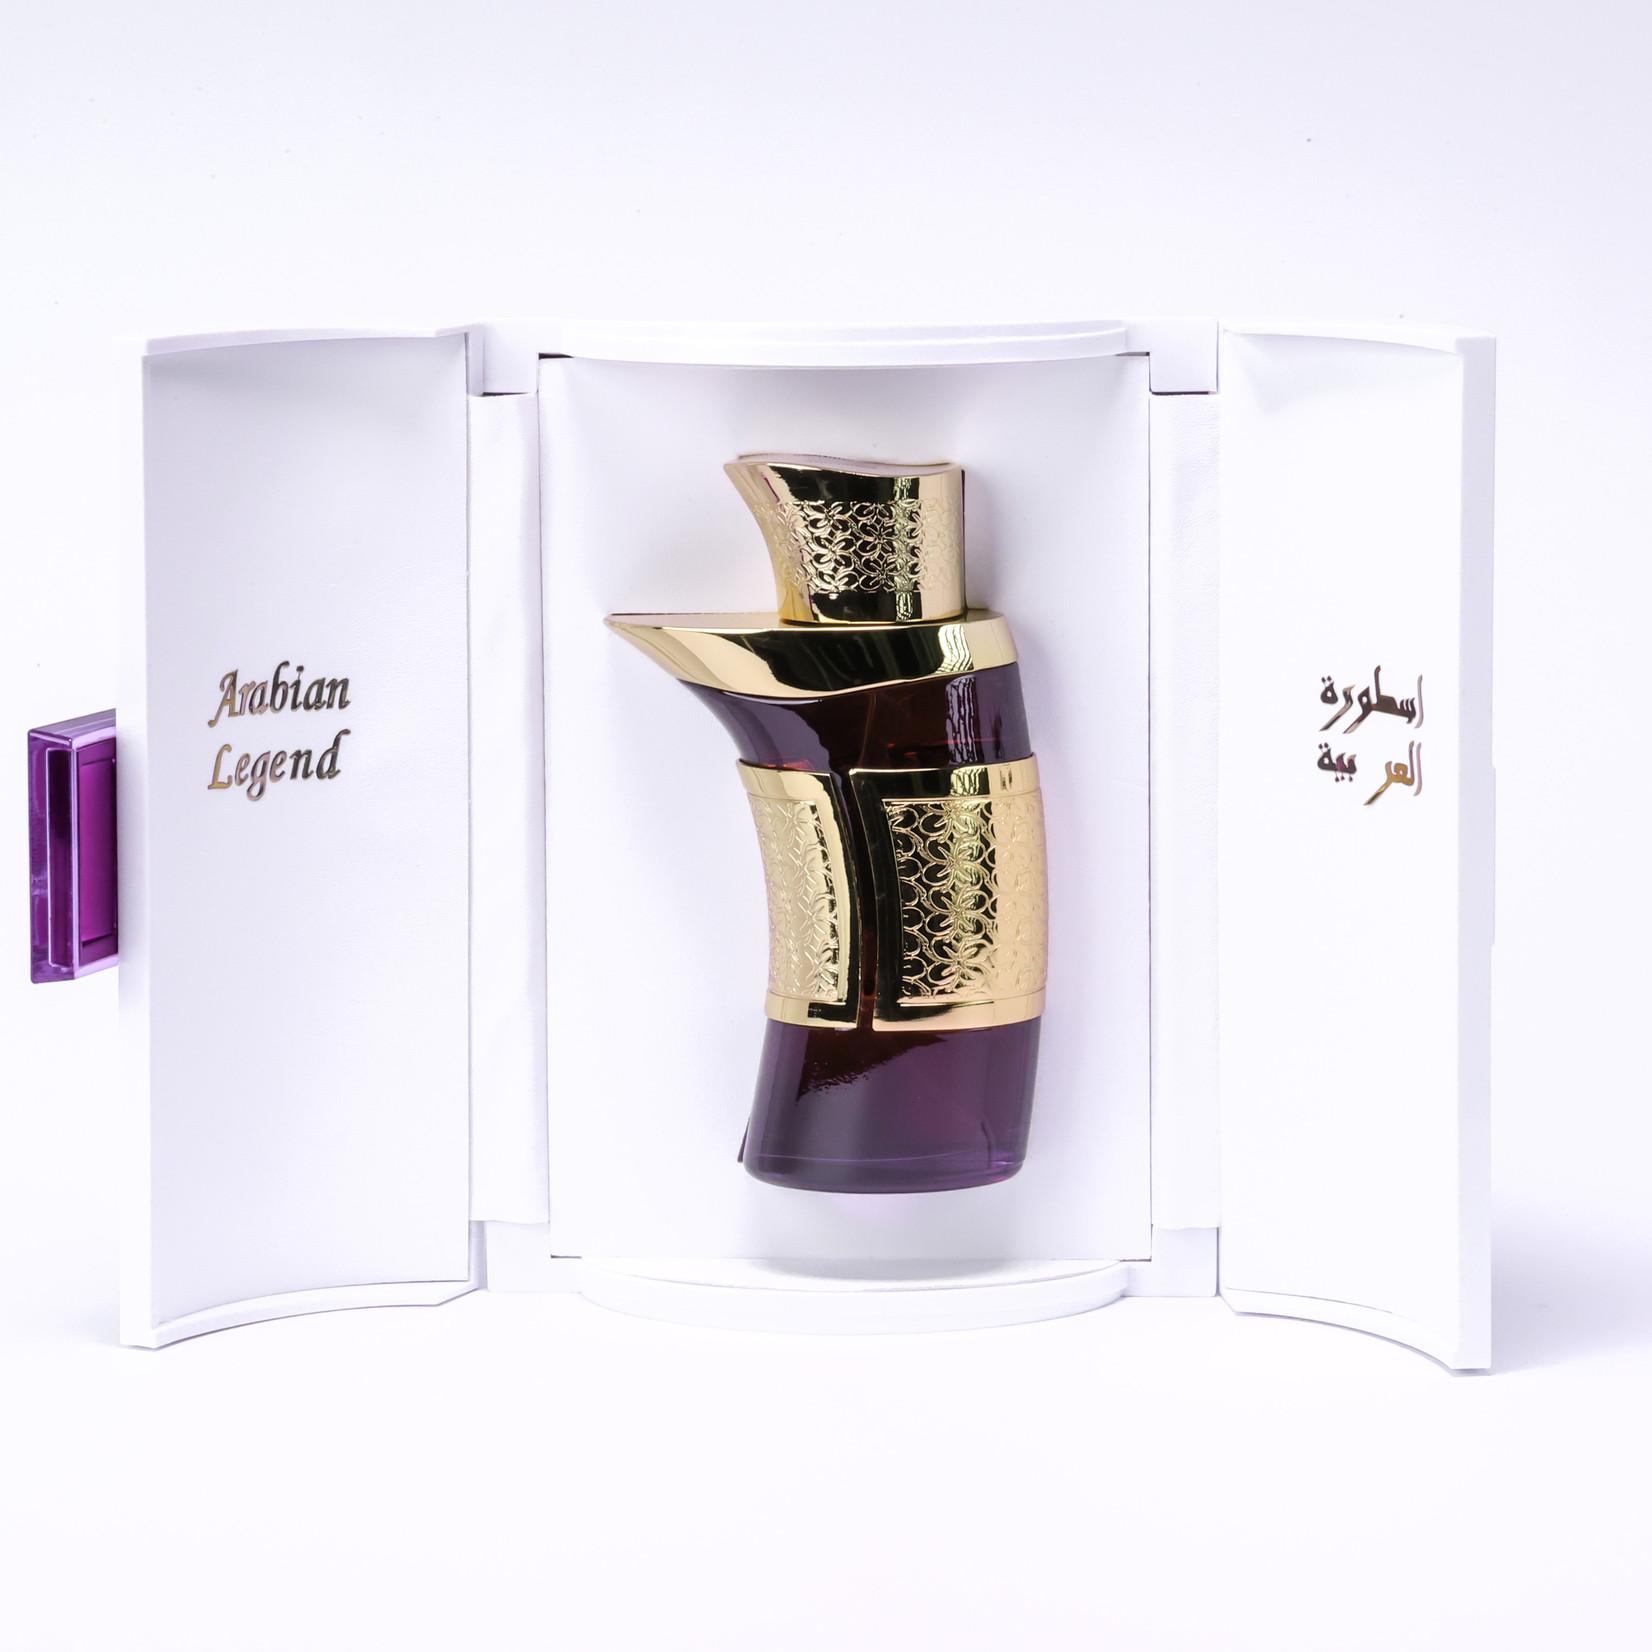 Arabian Oud Arabian Legend Gold (100ML Eau de Parfum)